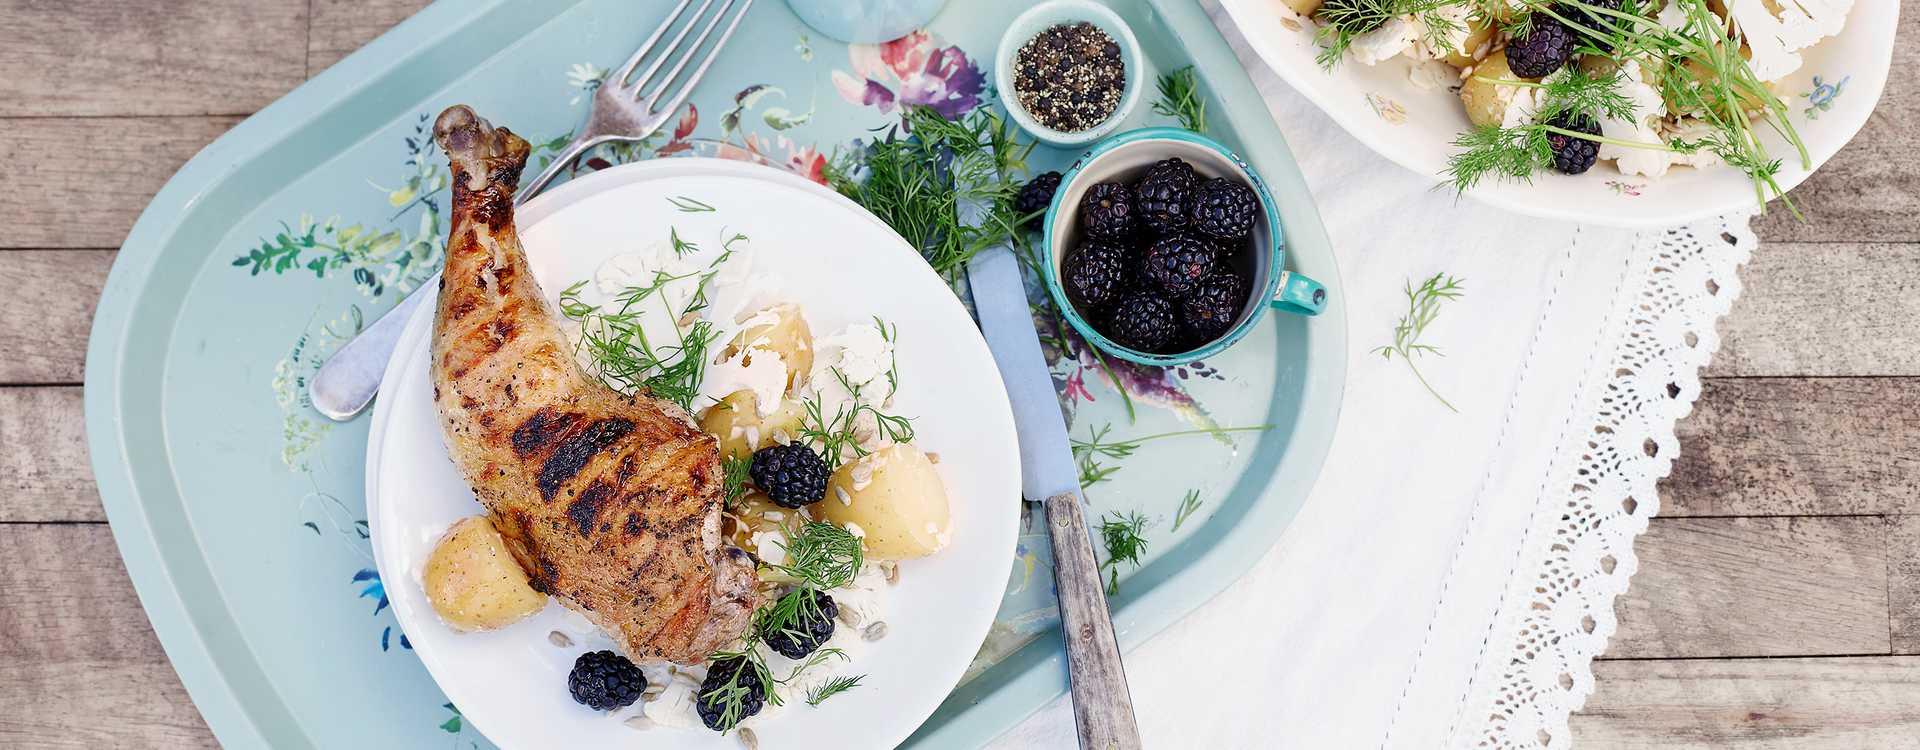 Kyllinglår og potetsalat